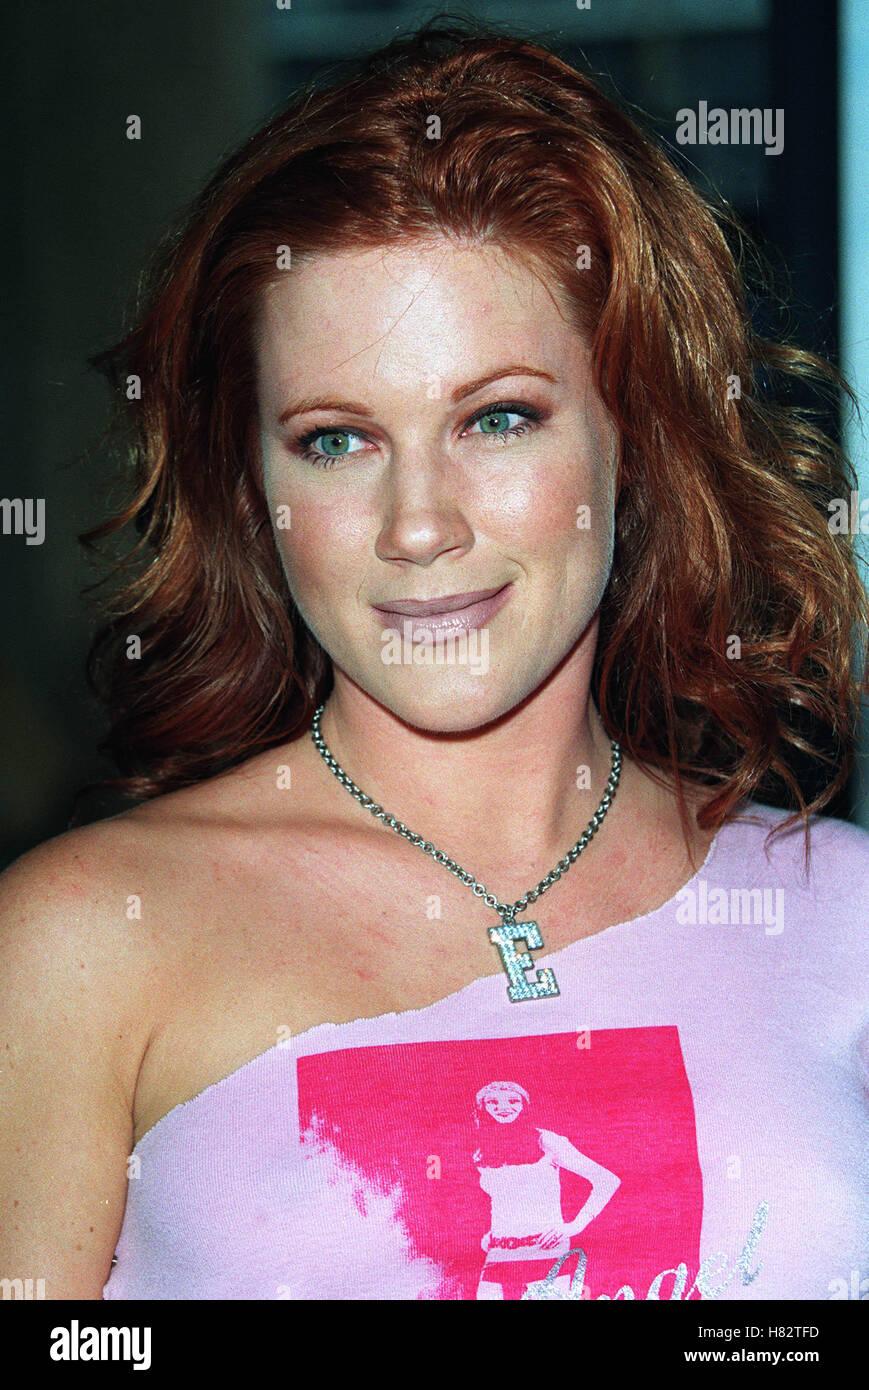 Bridget Everett born April 21, 1972 (age 46)